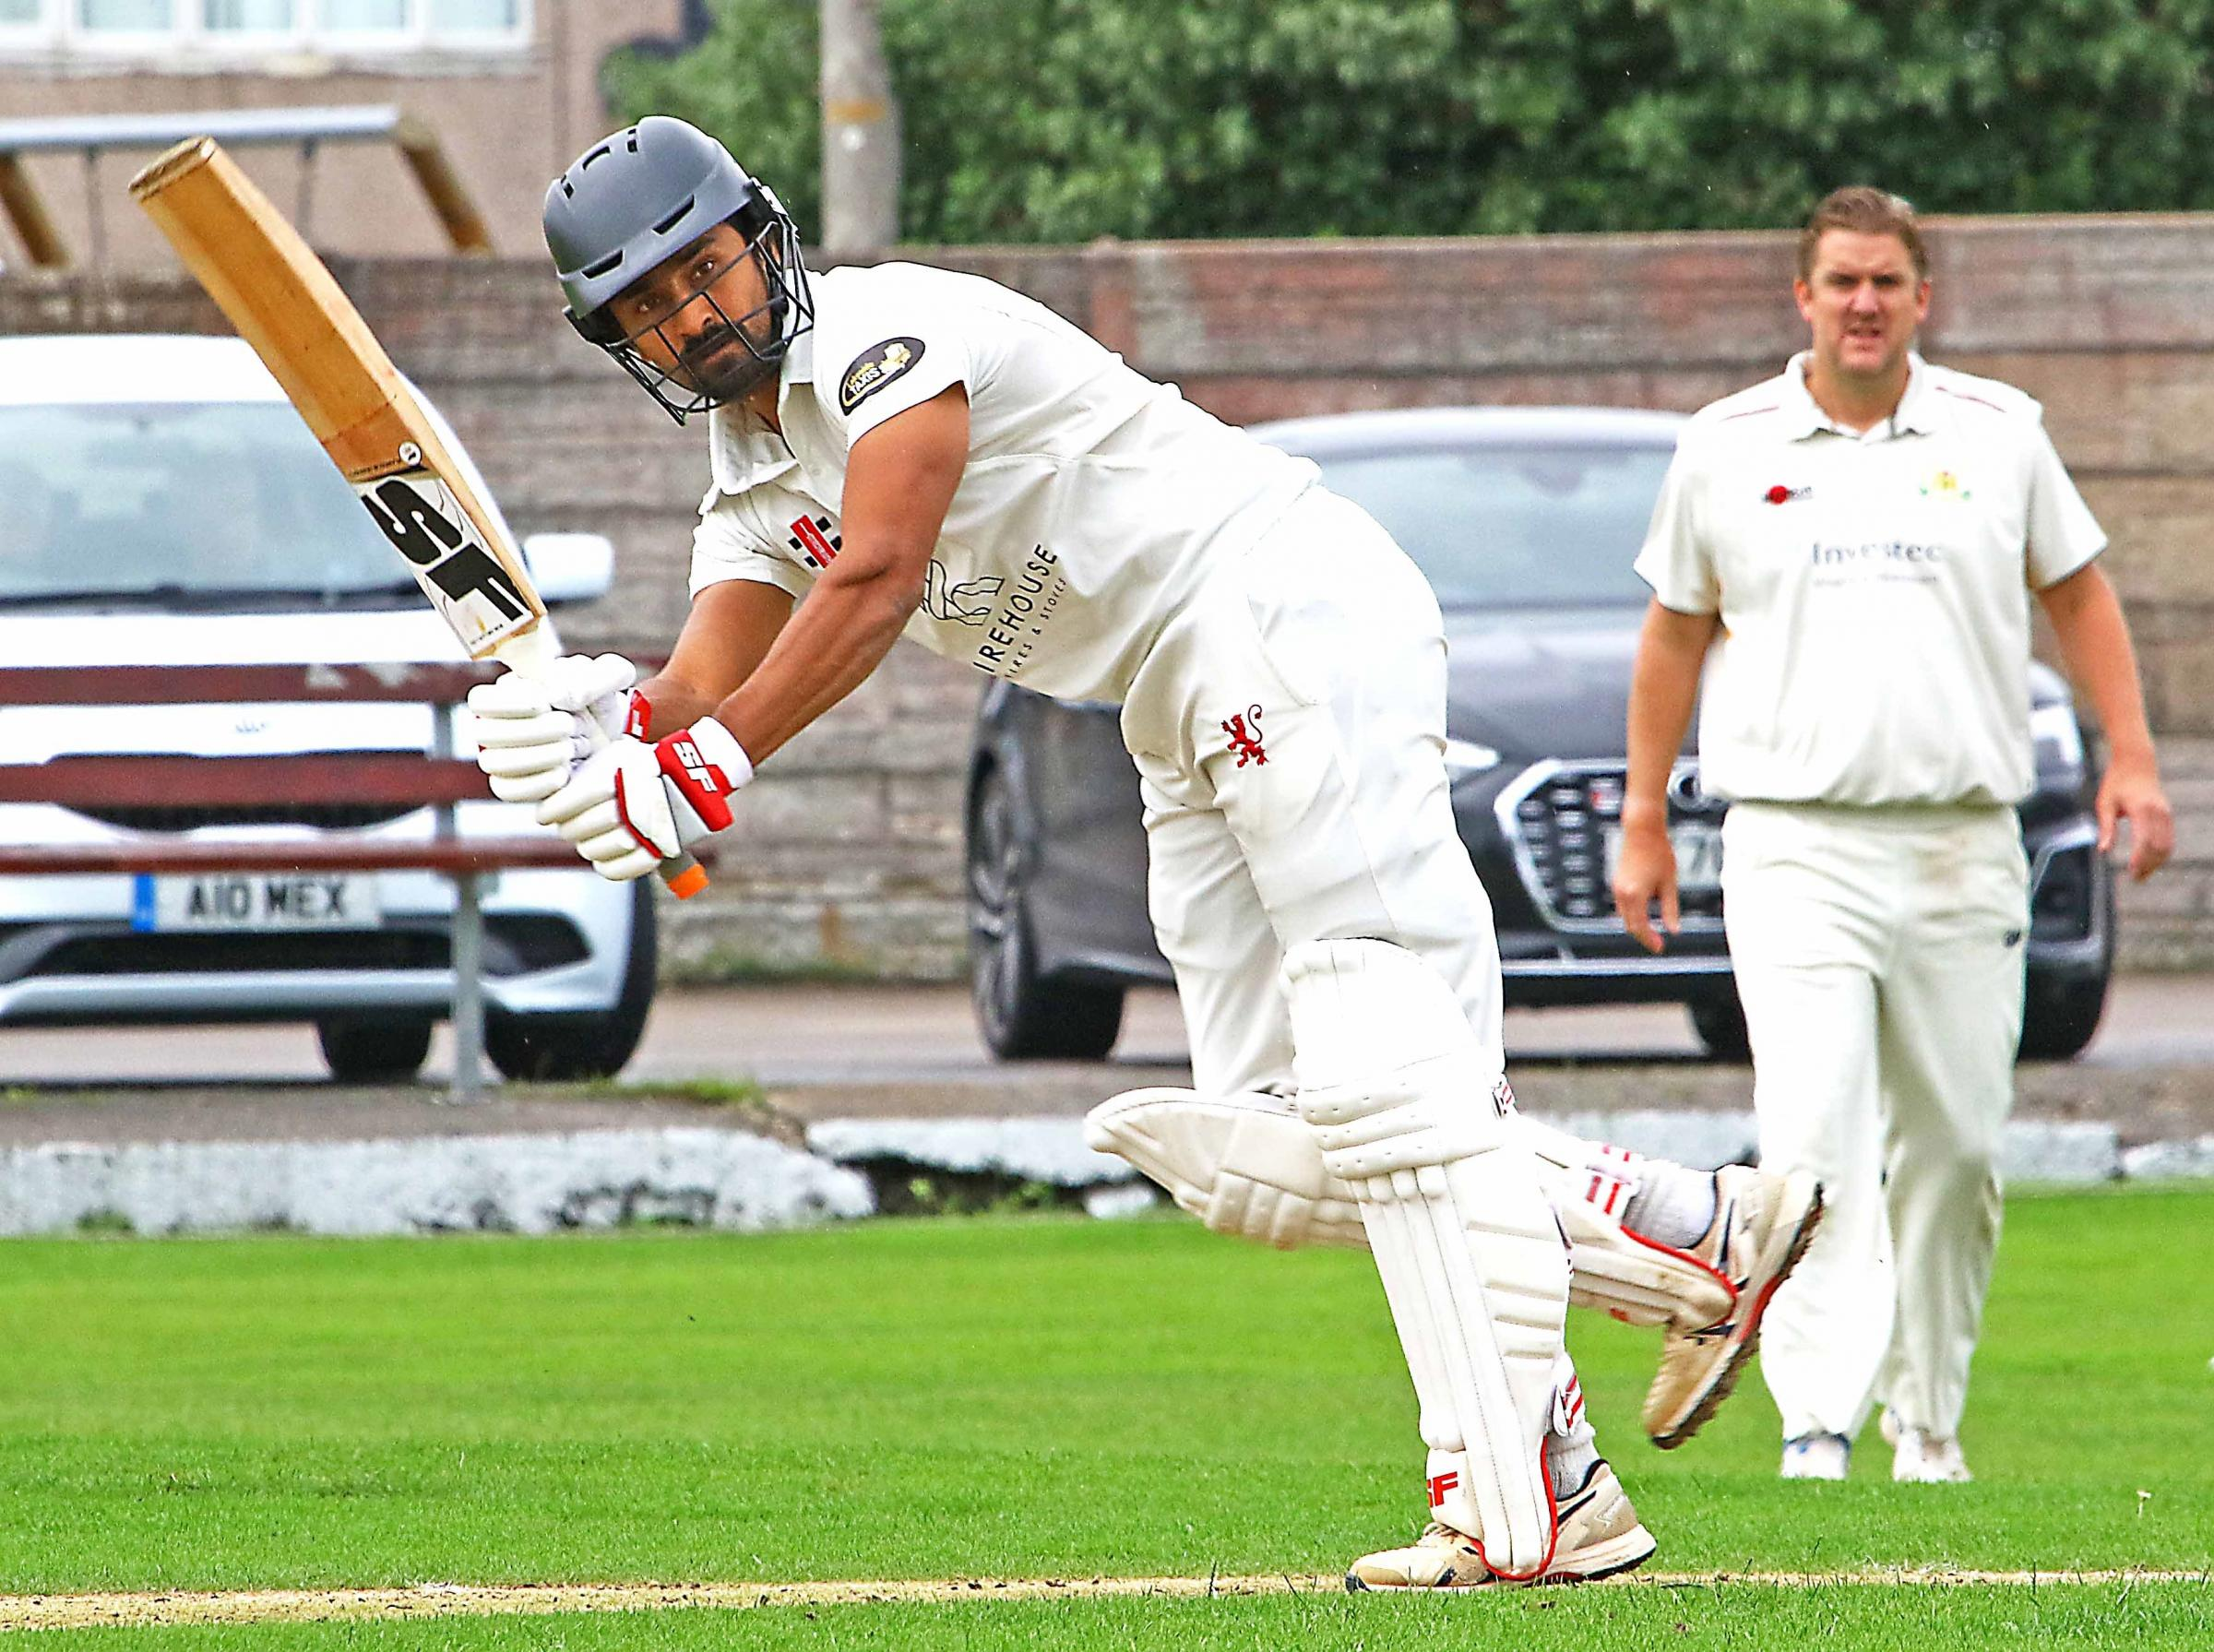 CRICKET: Shrikant Mundhe (Pic: Tony North. Report: Richard Edmondson)